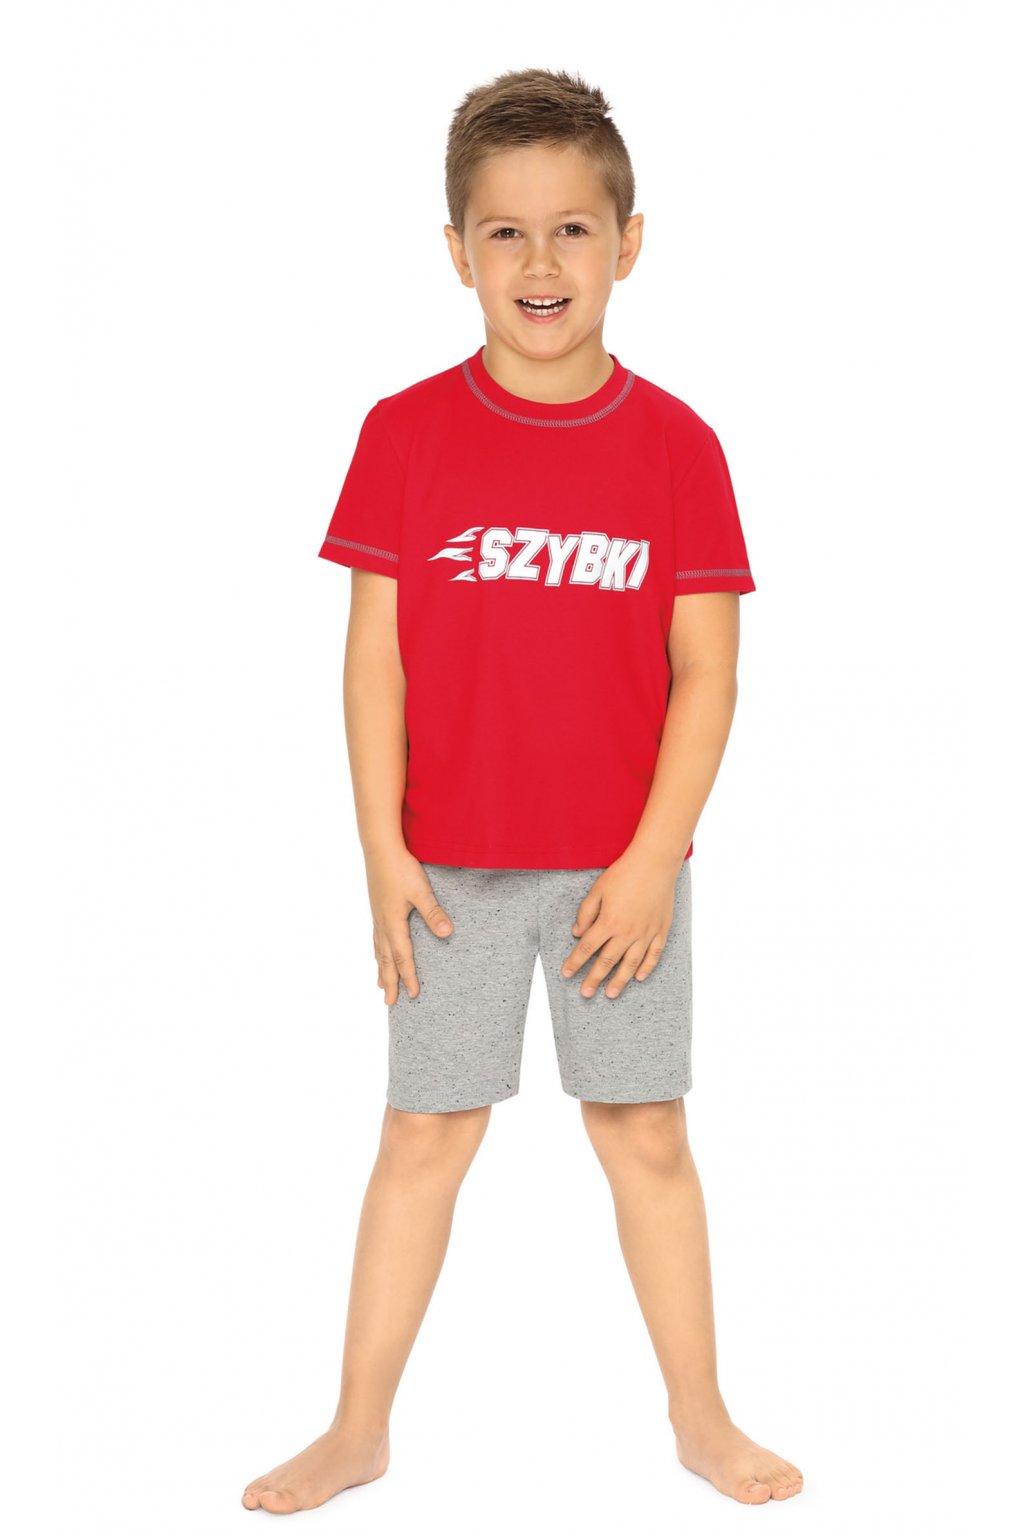 Chlapecké pyžamo s krátkým rukávem, 504104 258, červená